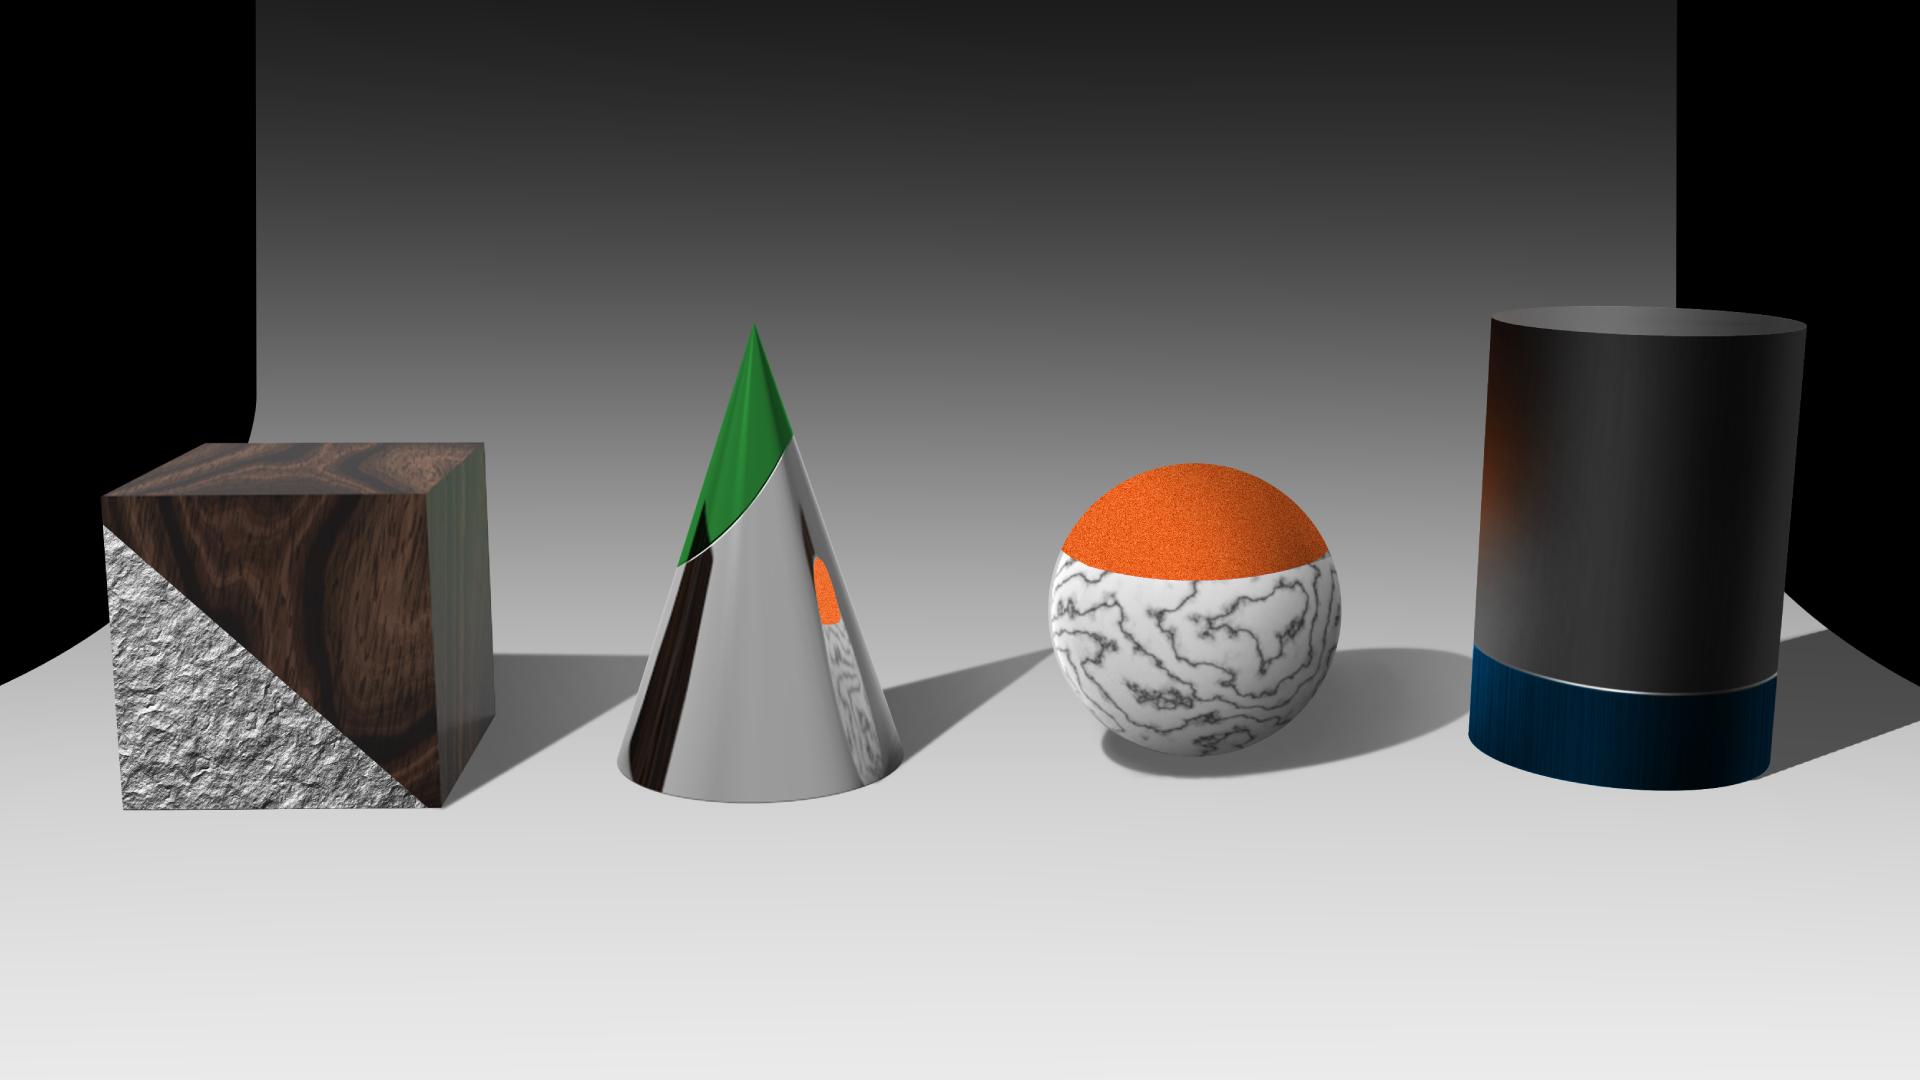 evan-howard-4-shapes-8-materials